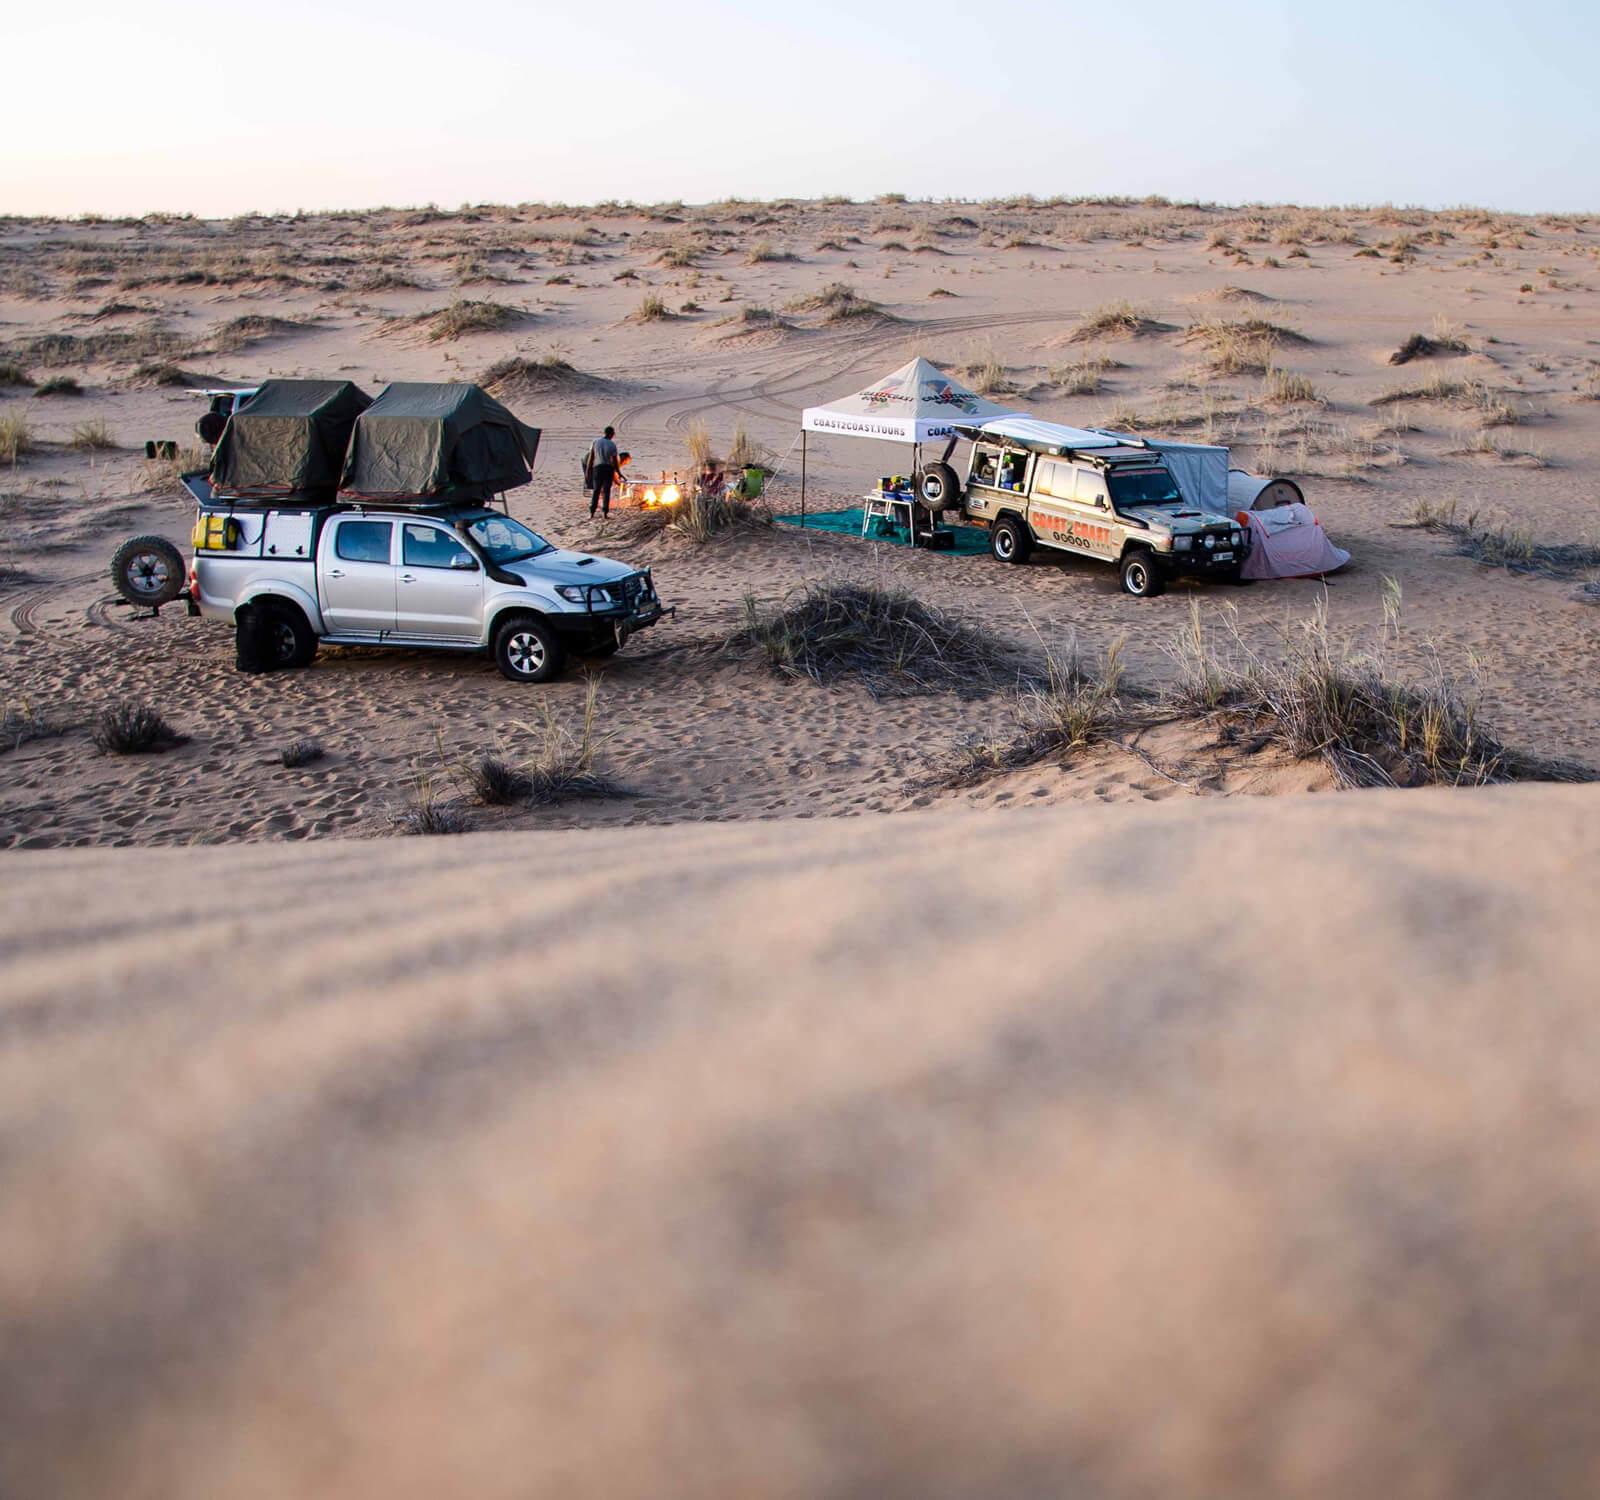 Coast 2 Coast Tours   Selfdrive 4x4 safaris and vehicle hire